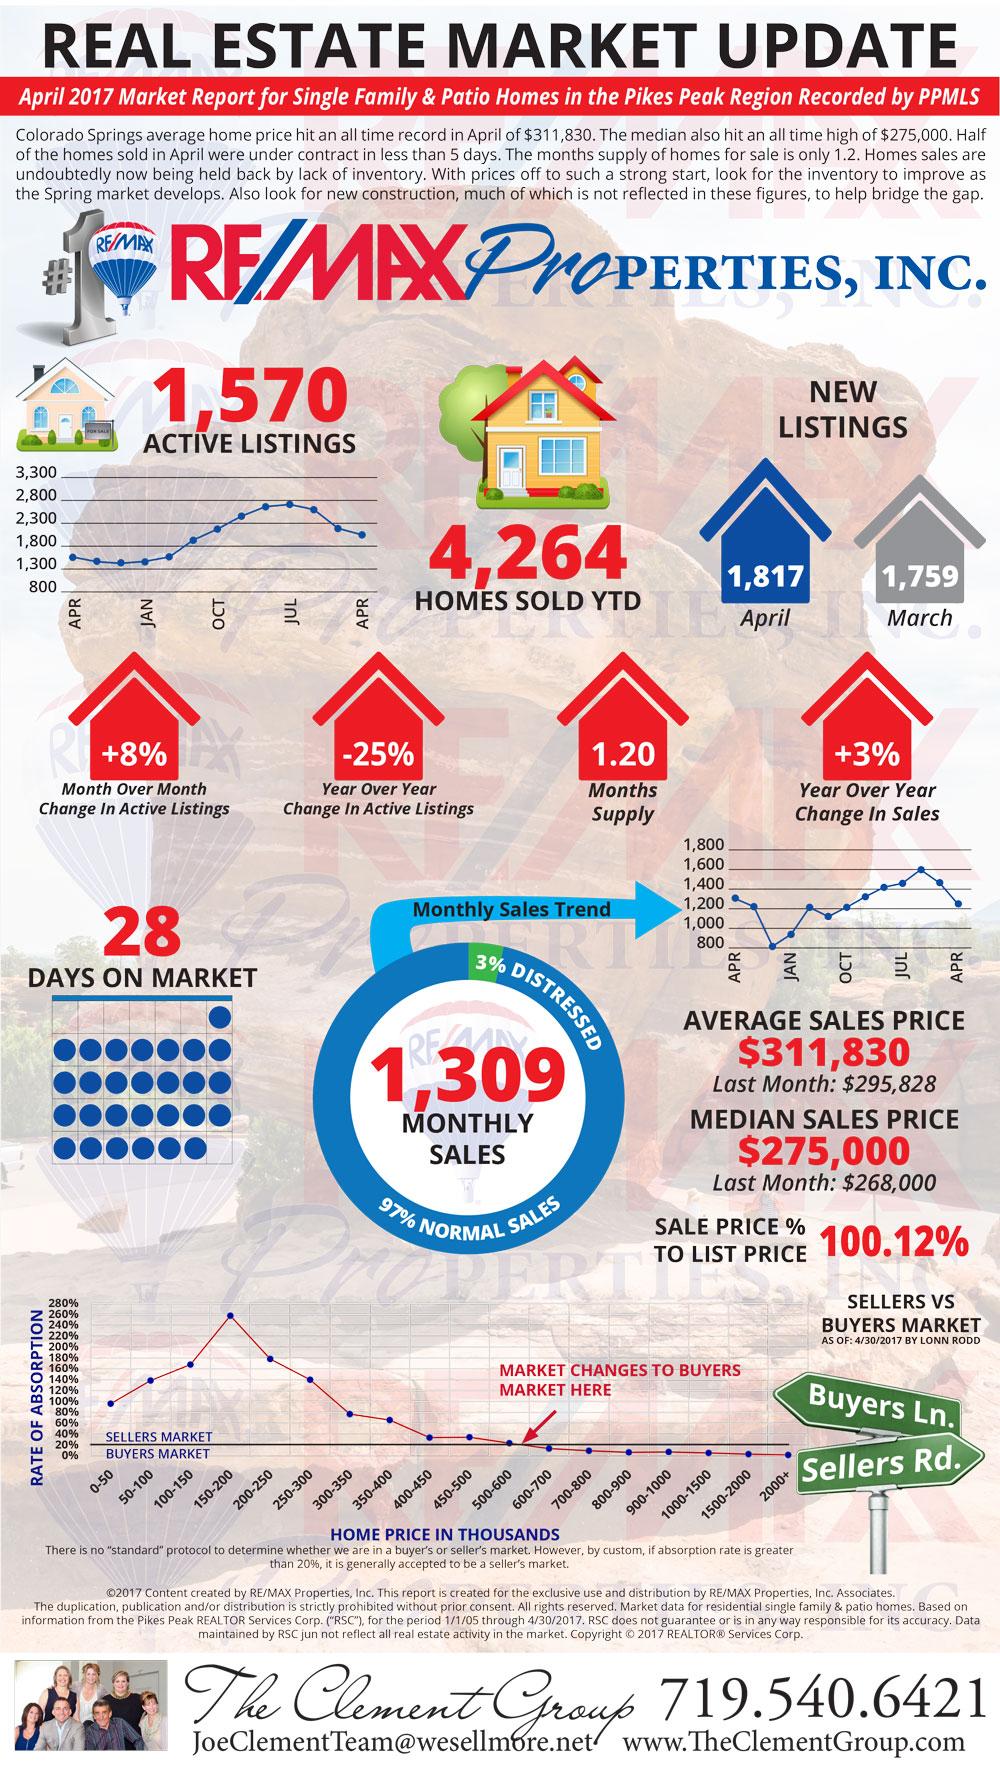 April 2017 Market Update - Colorado Springs Real Estate